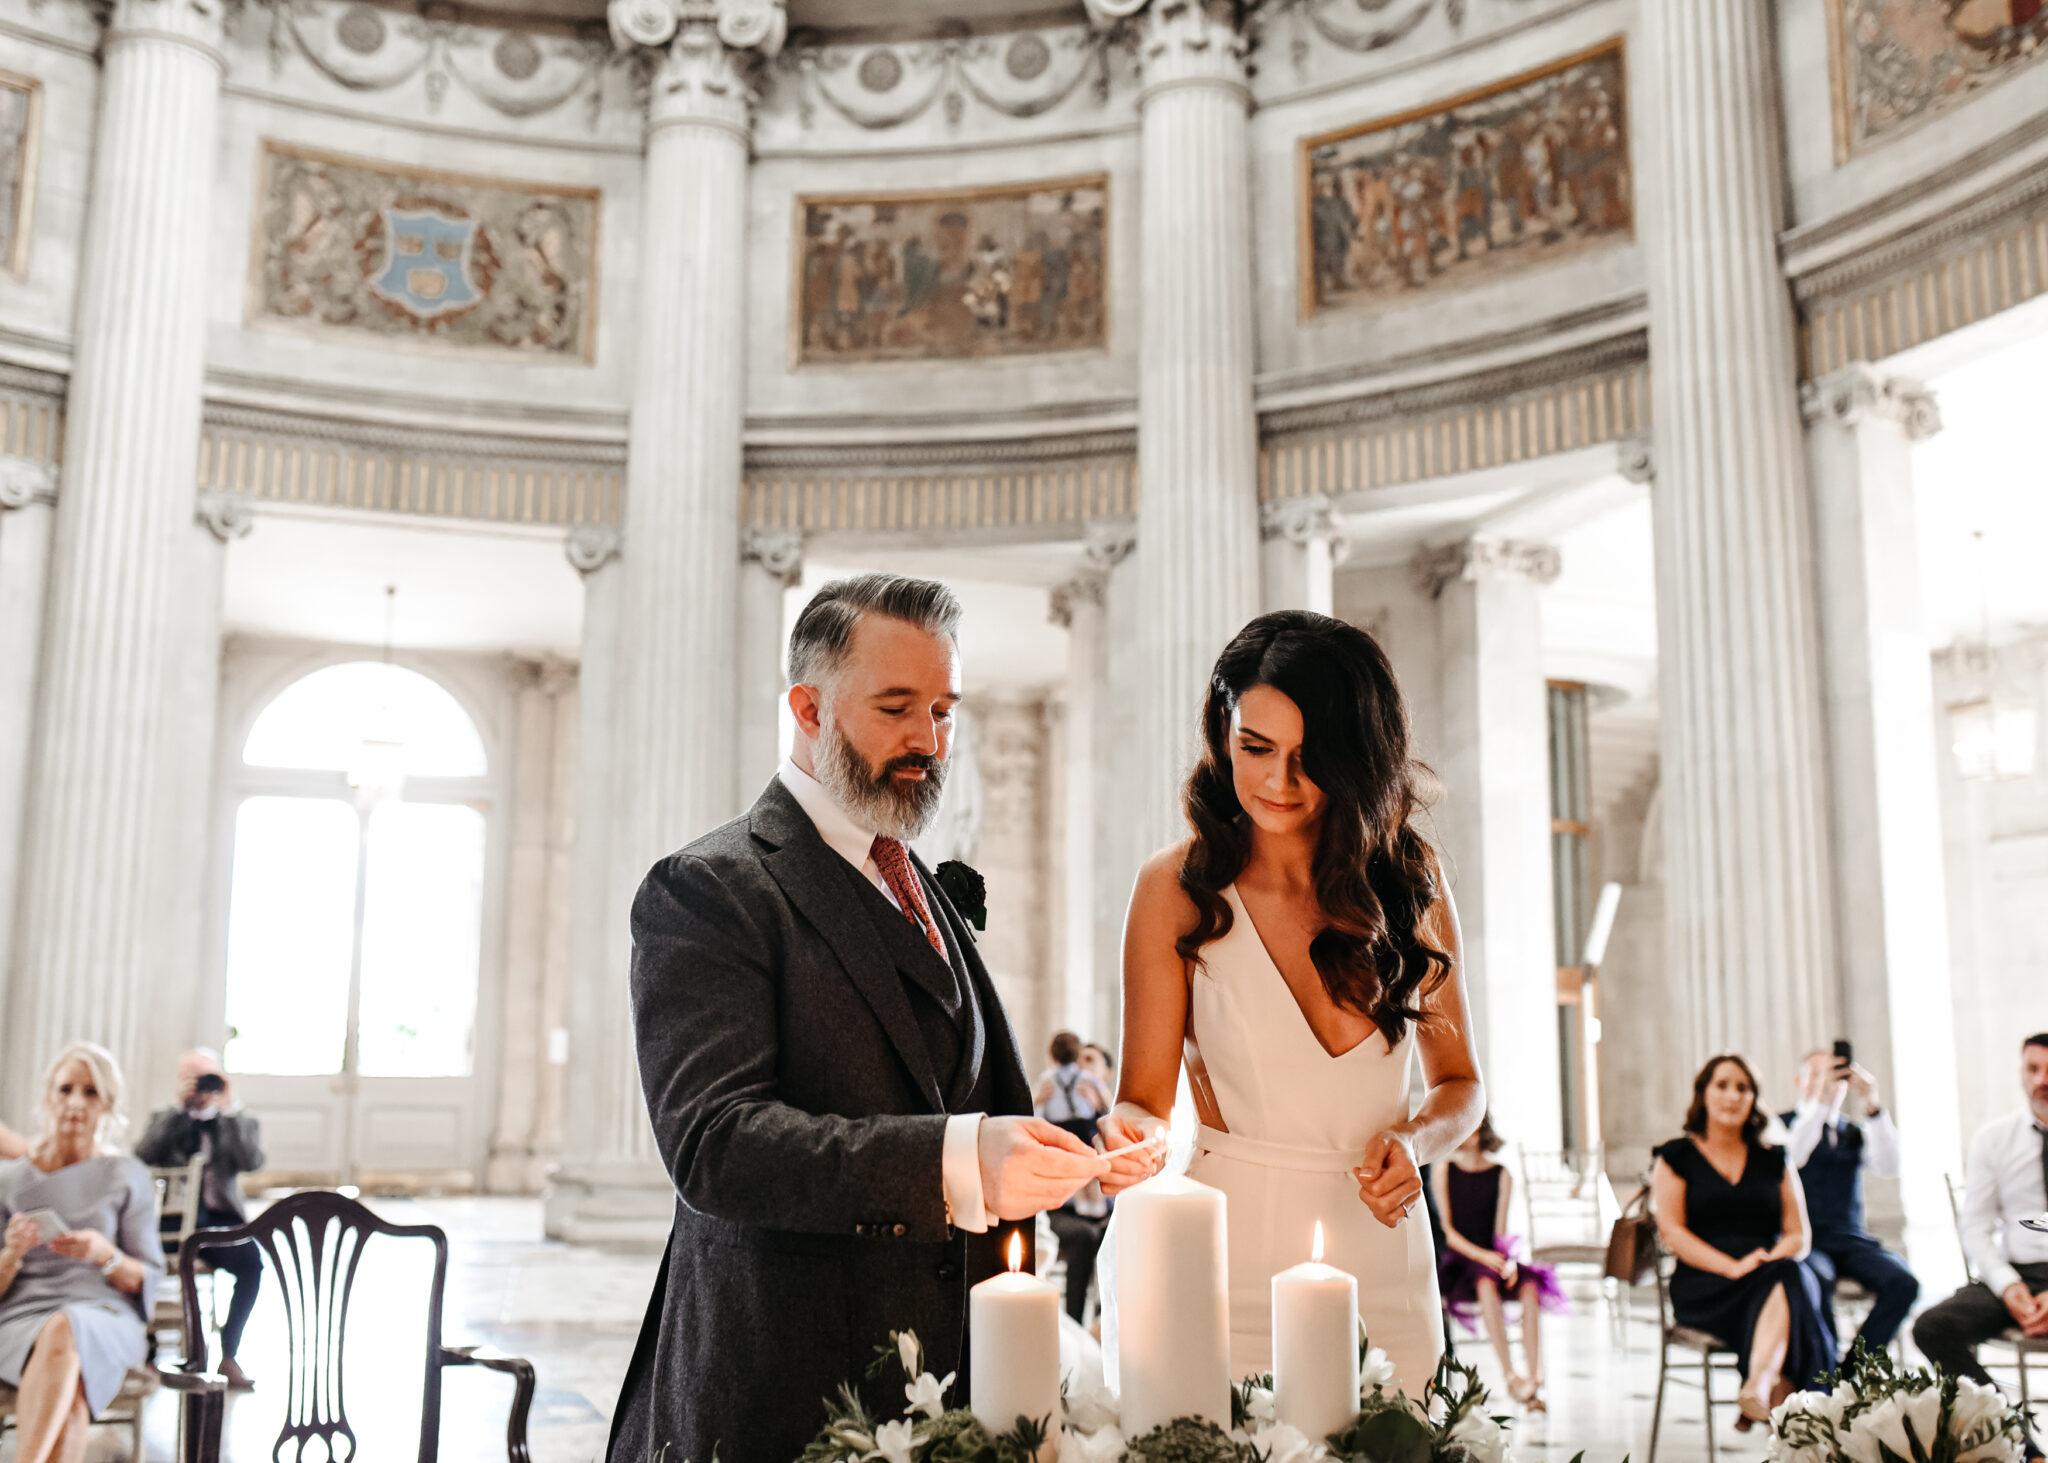 City Hall Wedding Photos Intercontinental Hotel Dublin 10